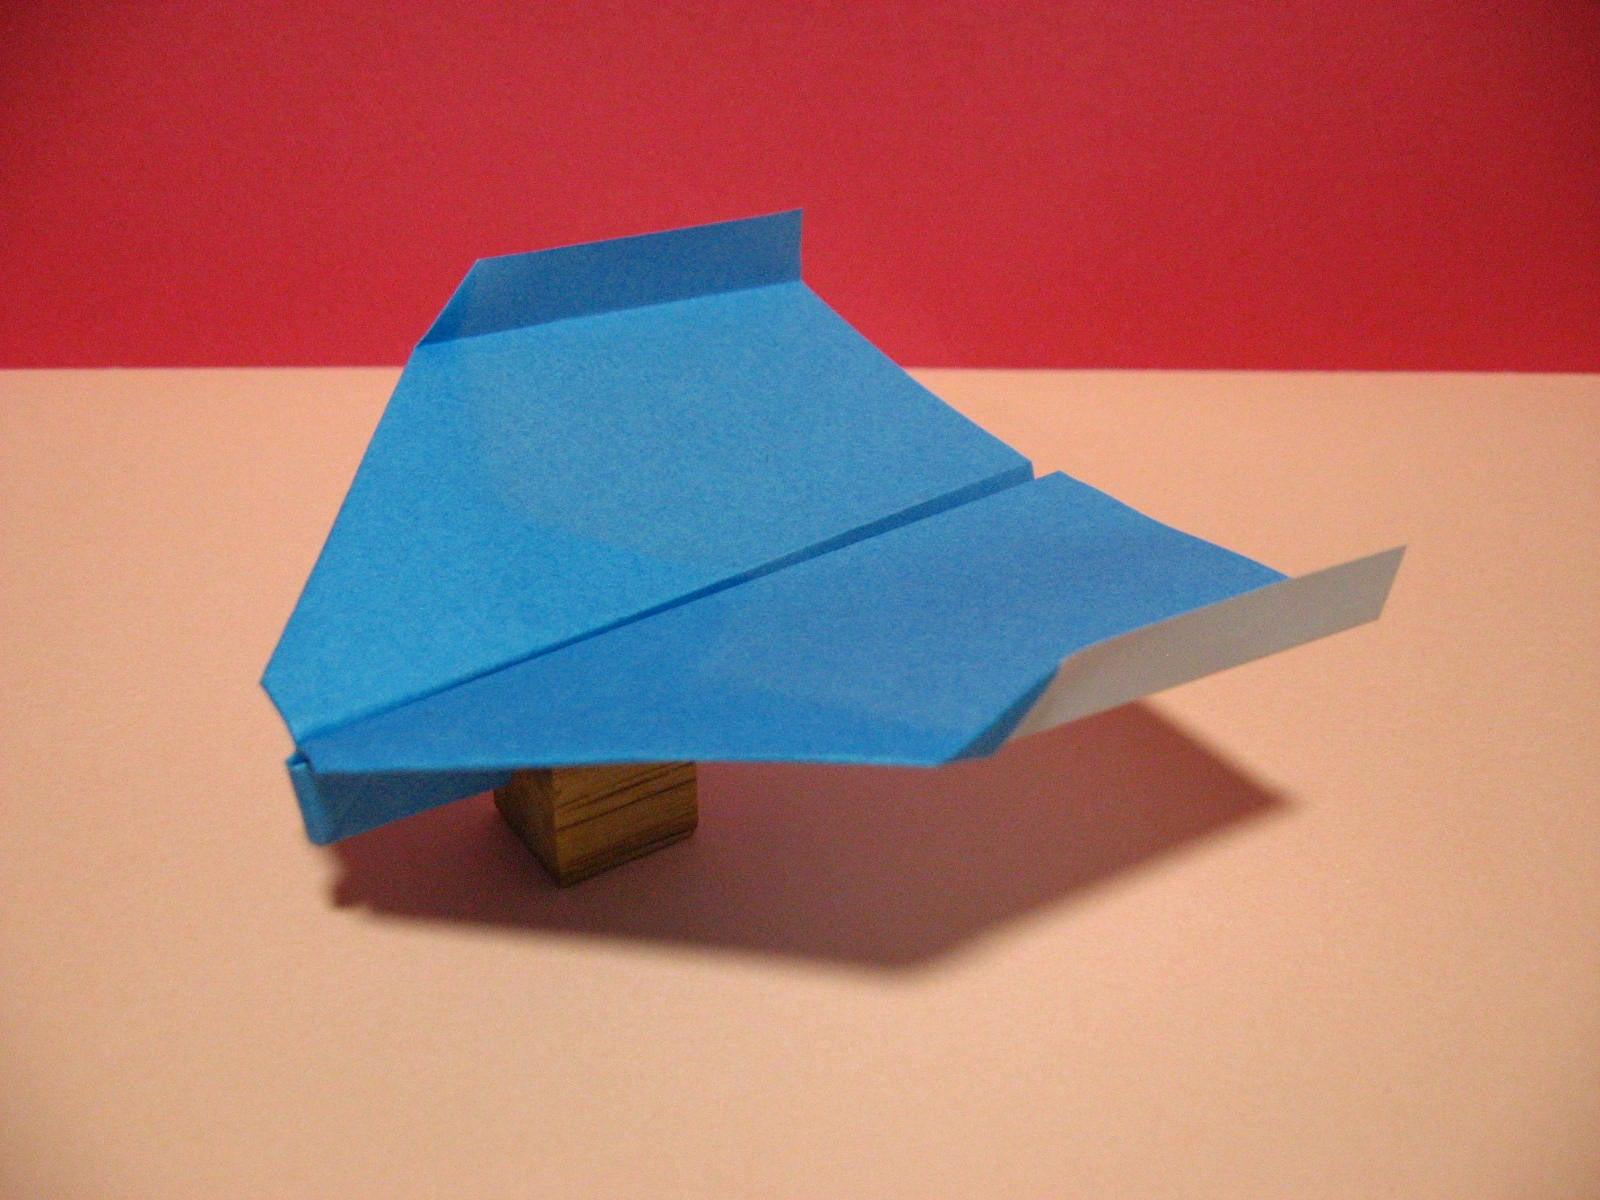 紙 飛行機 一 飛ぶ 世界